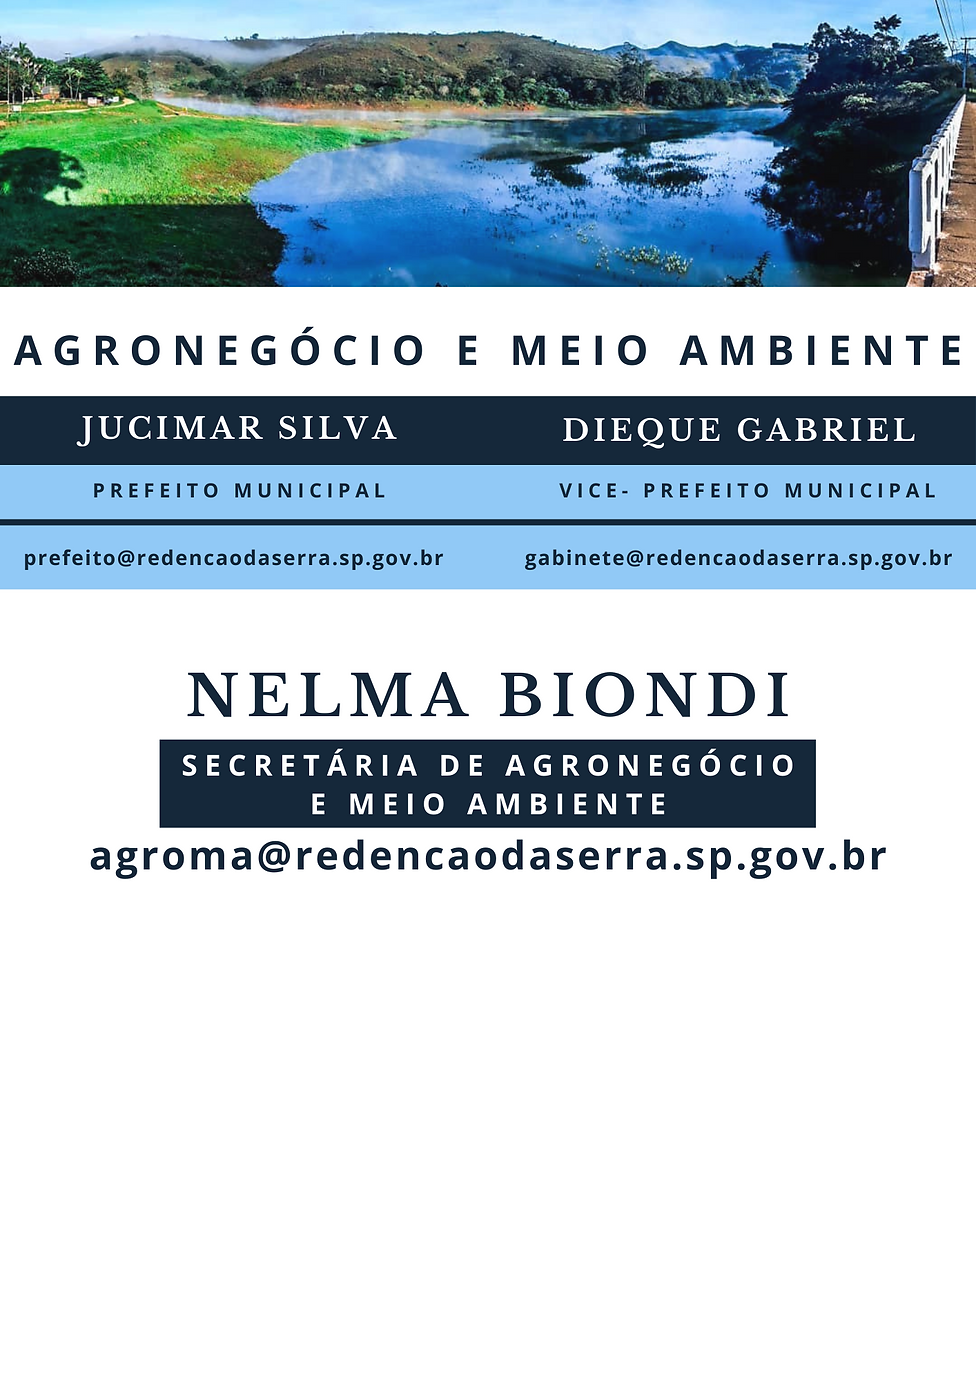 Agronegócio e Meio Ambiente.png